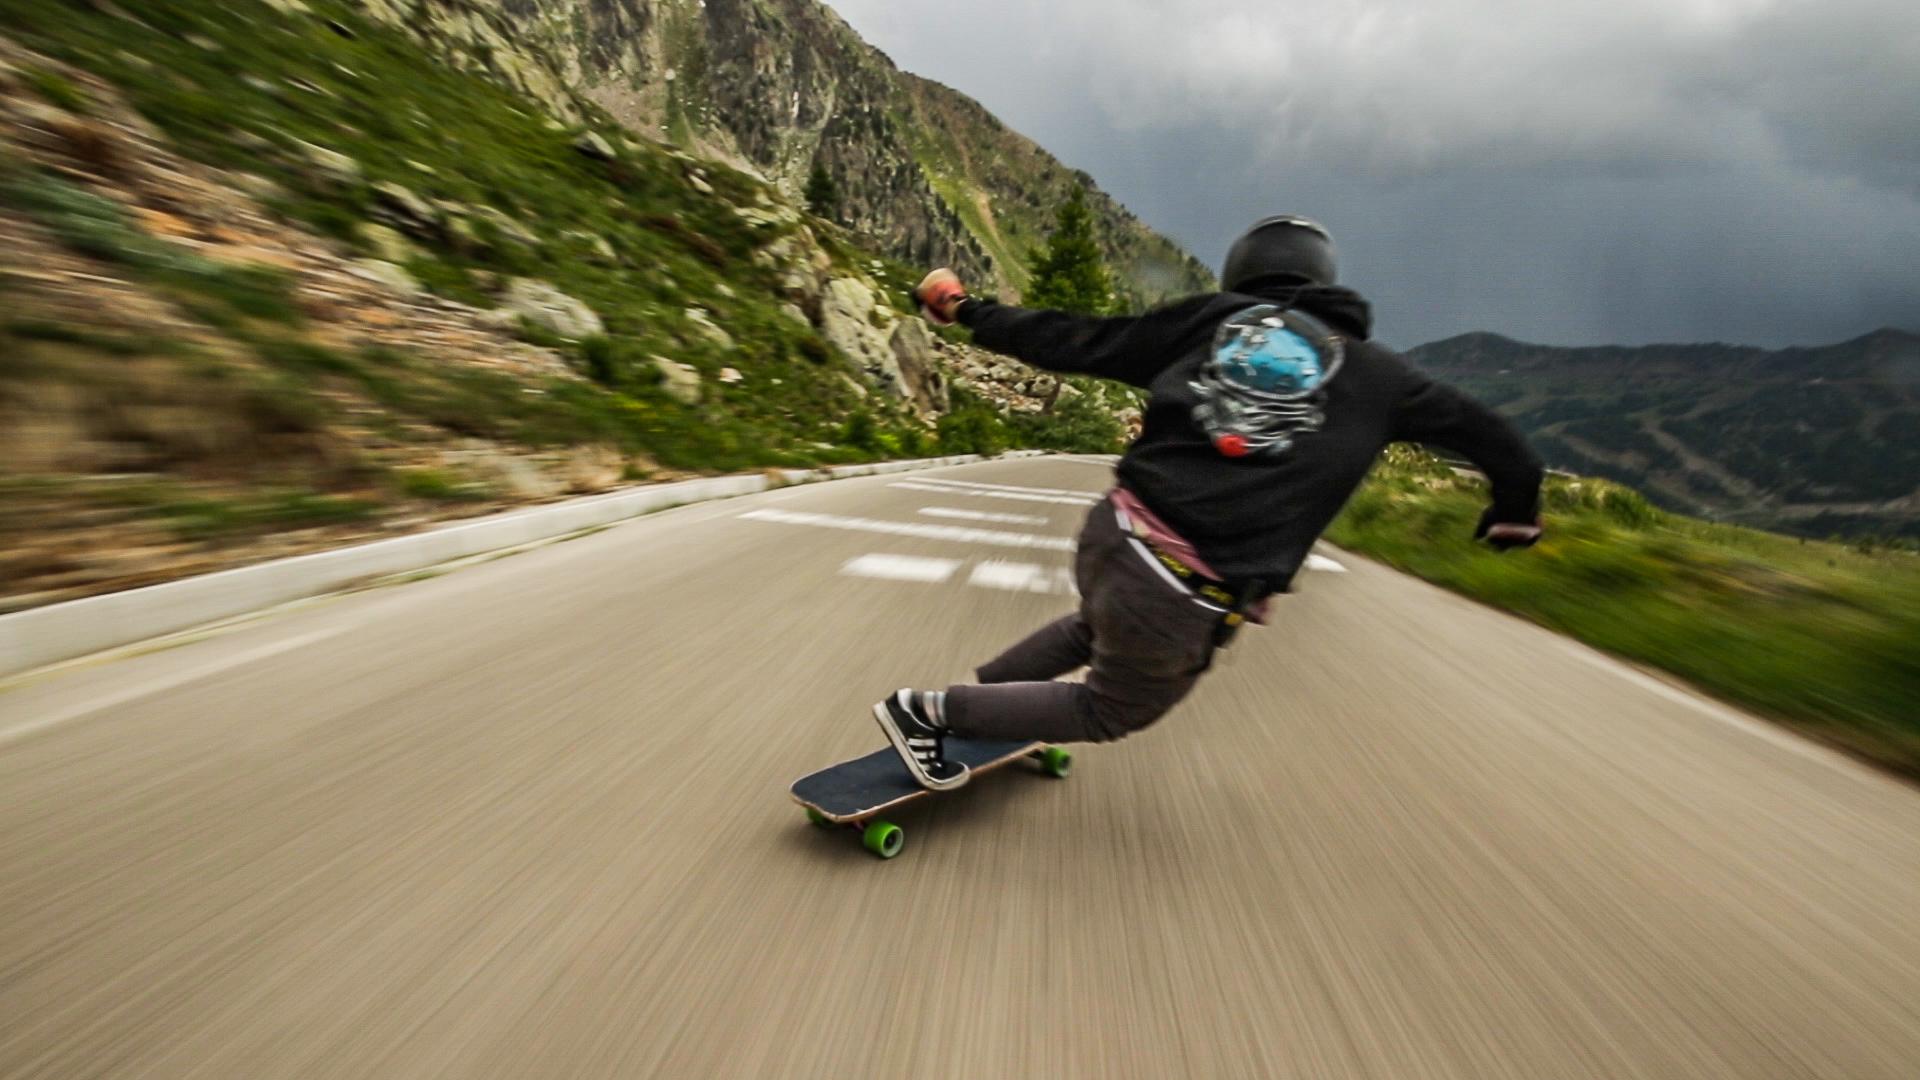 """Raw Run: The Cliffs of France"" follows Josh Neuman longboarding down a narrow highway in France."